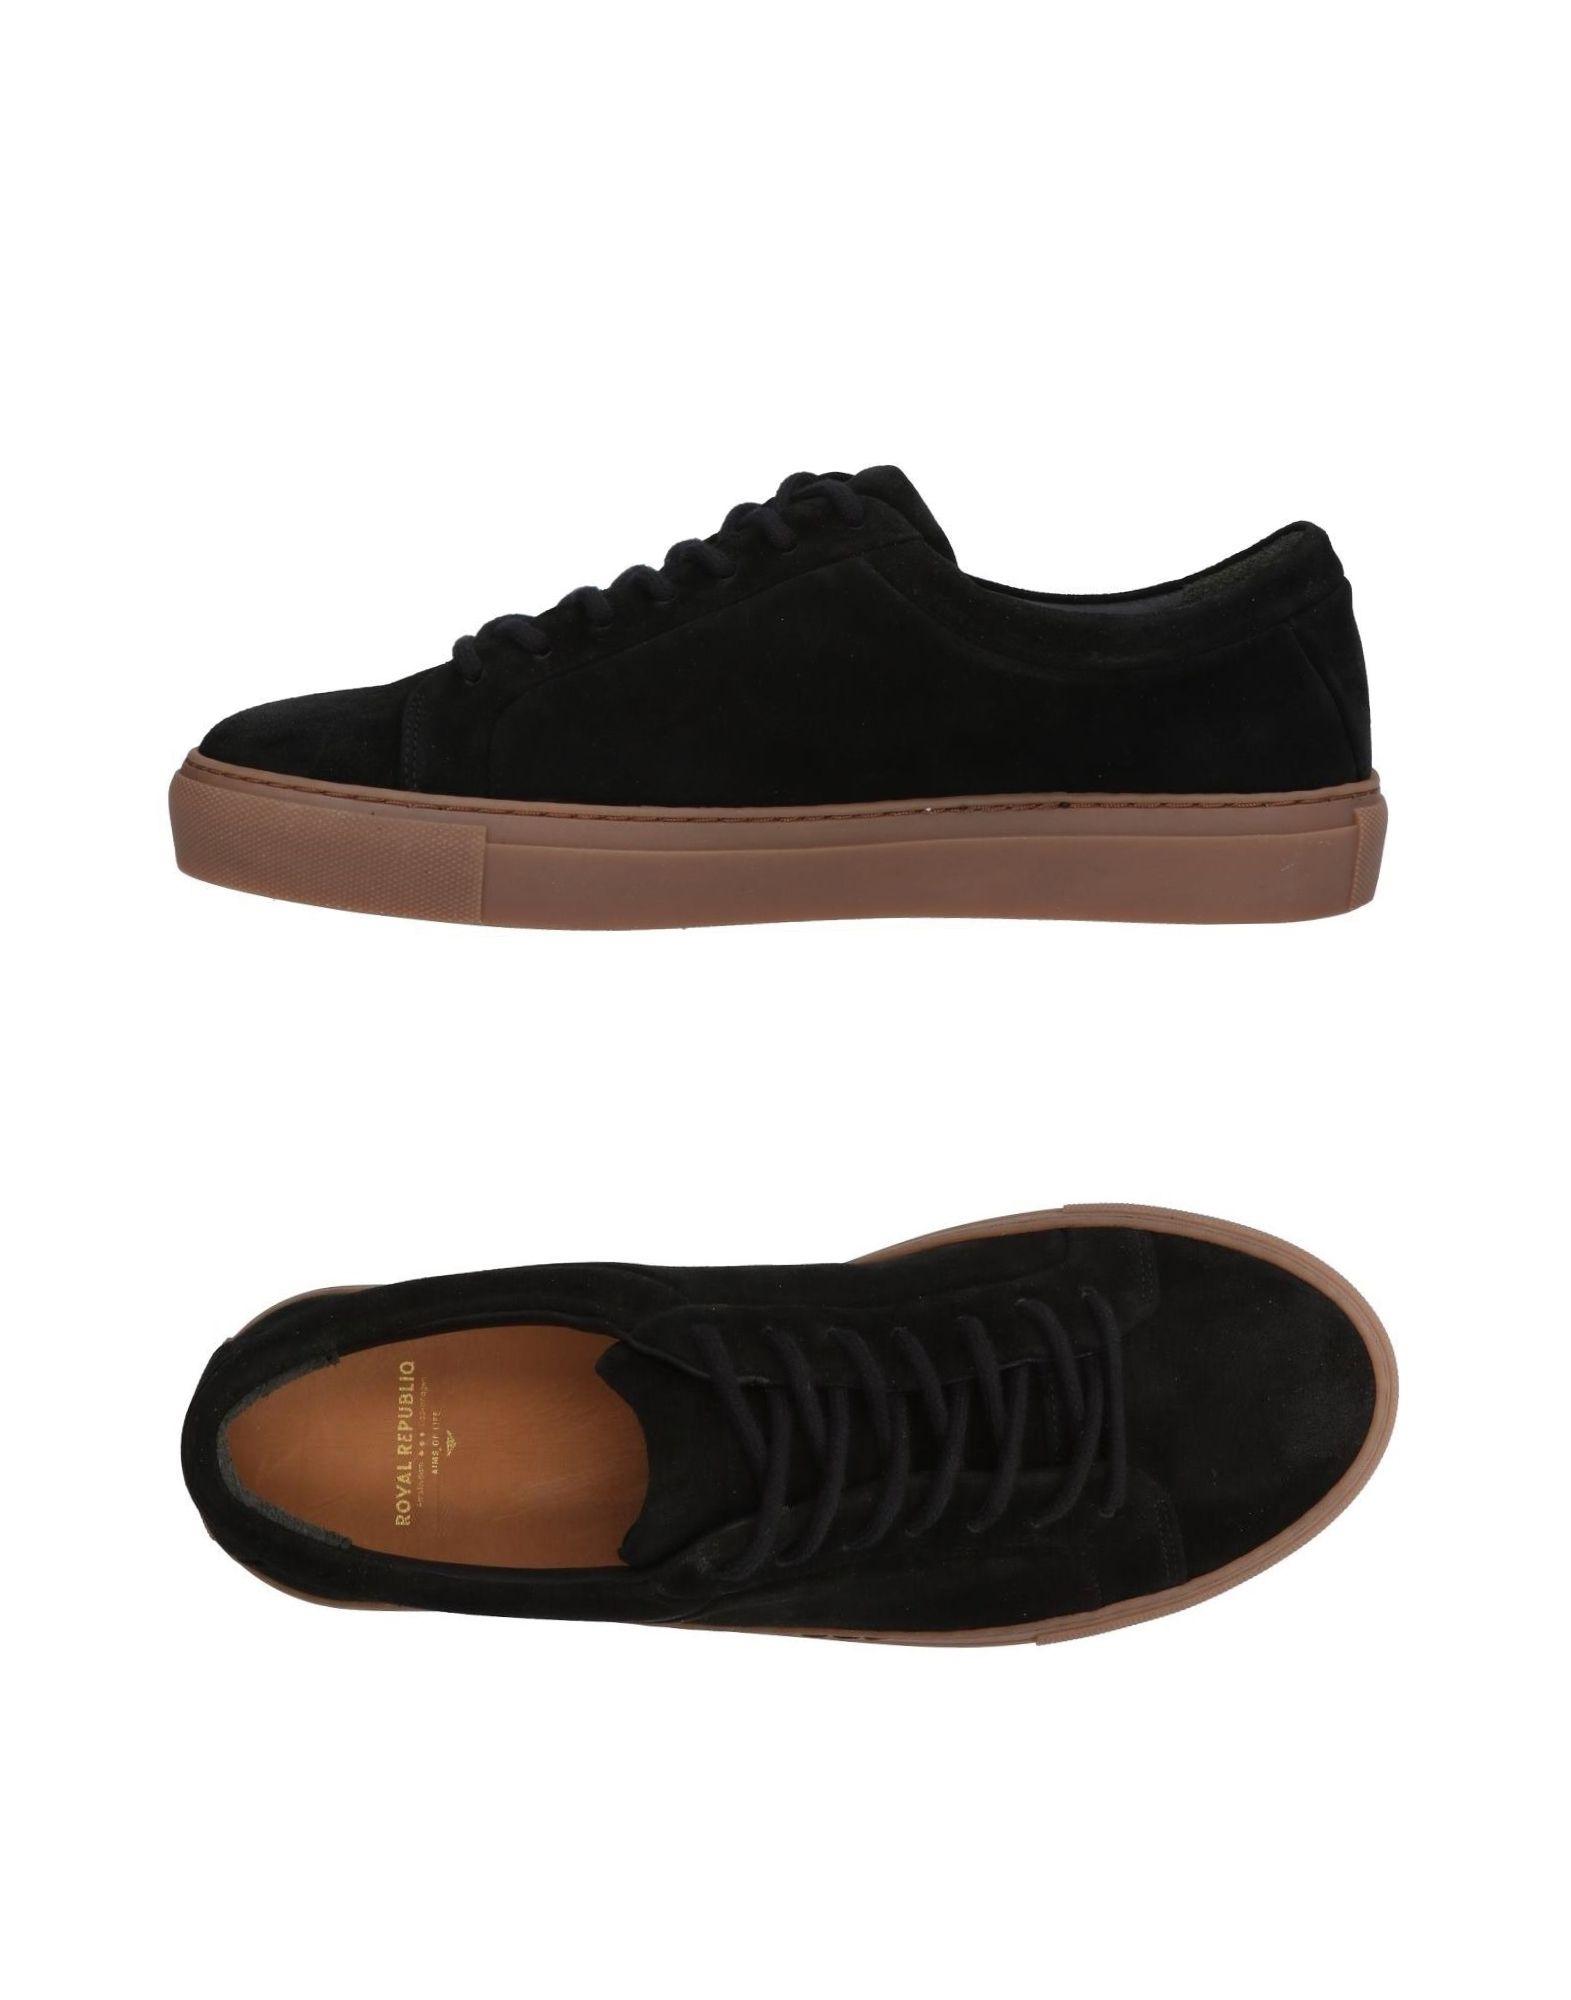 Royal Republiq Sneakers Herren  11416726WB 11416726WB  Neue Schuhe 32d173